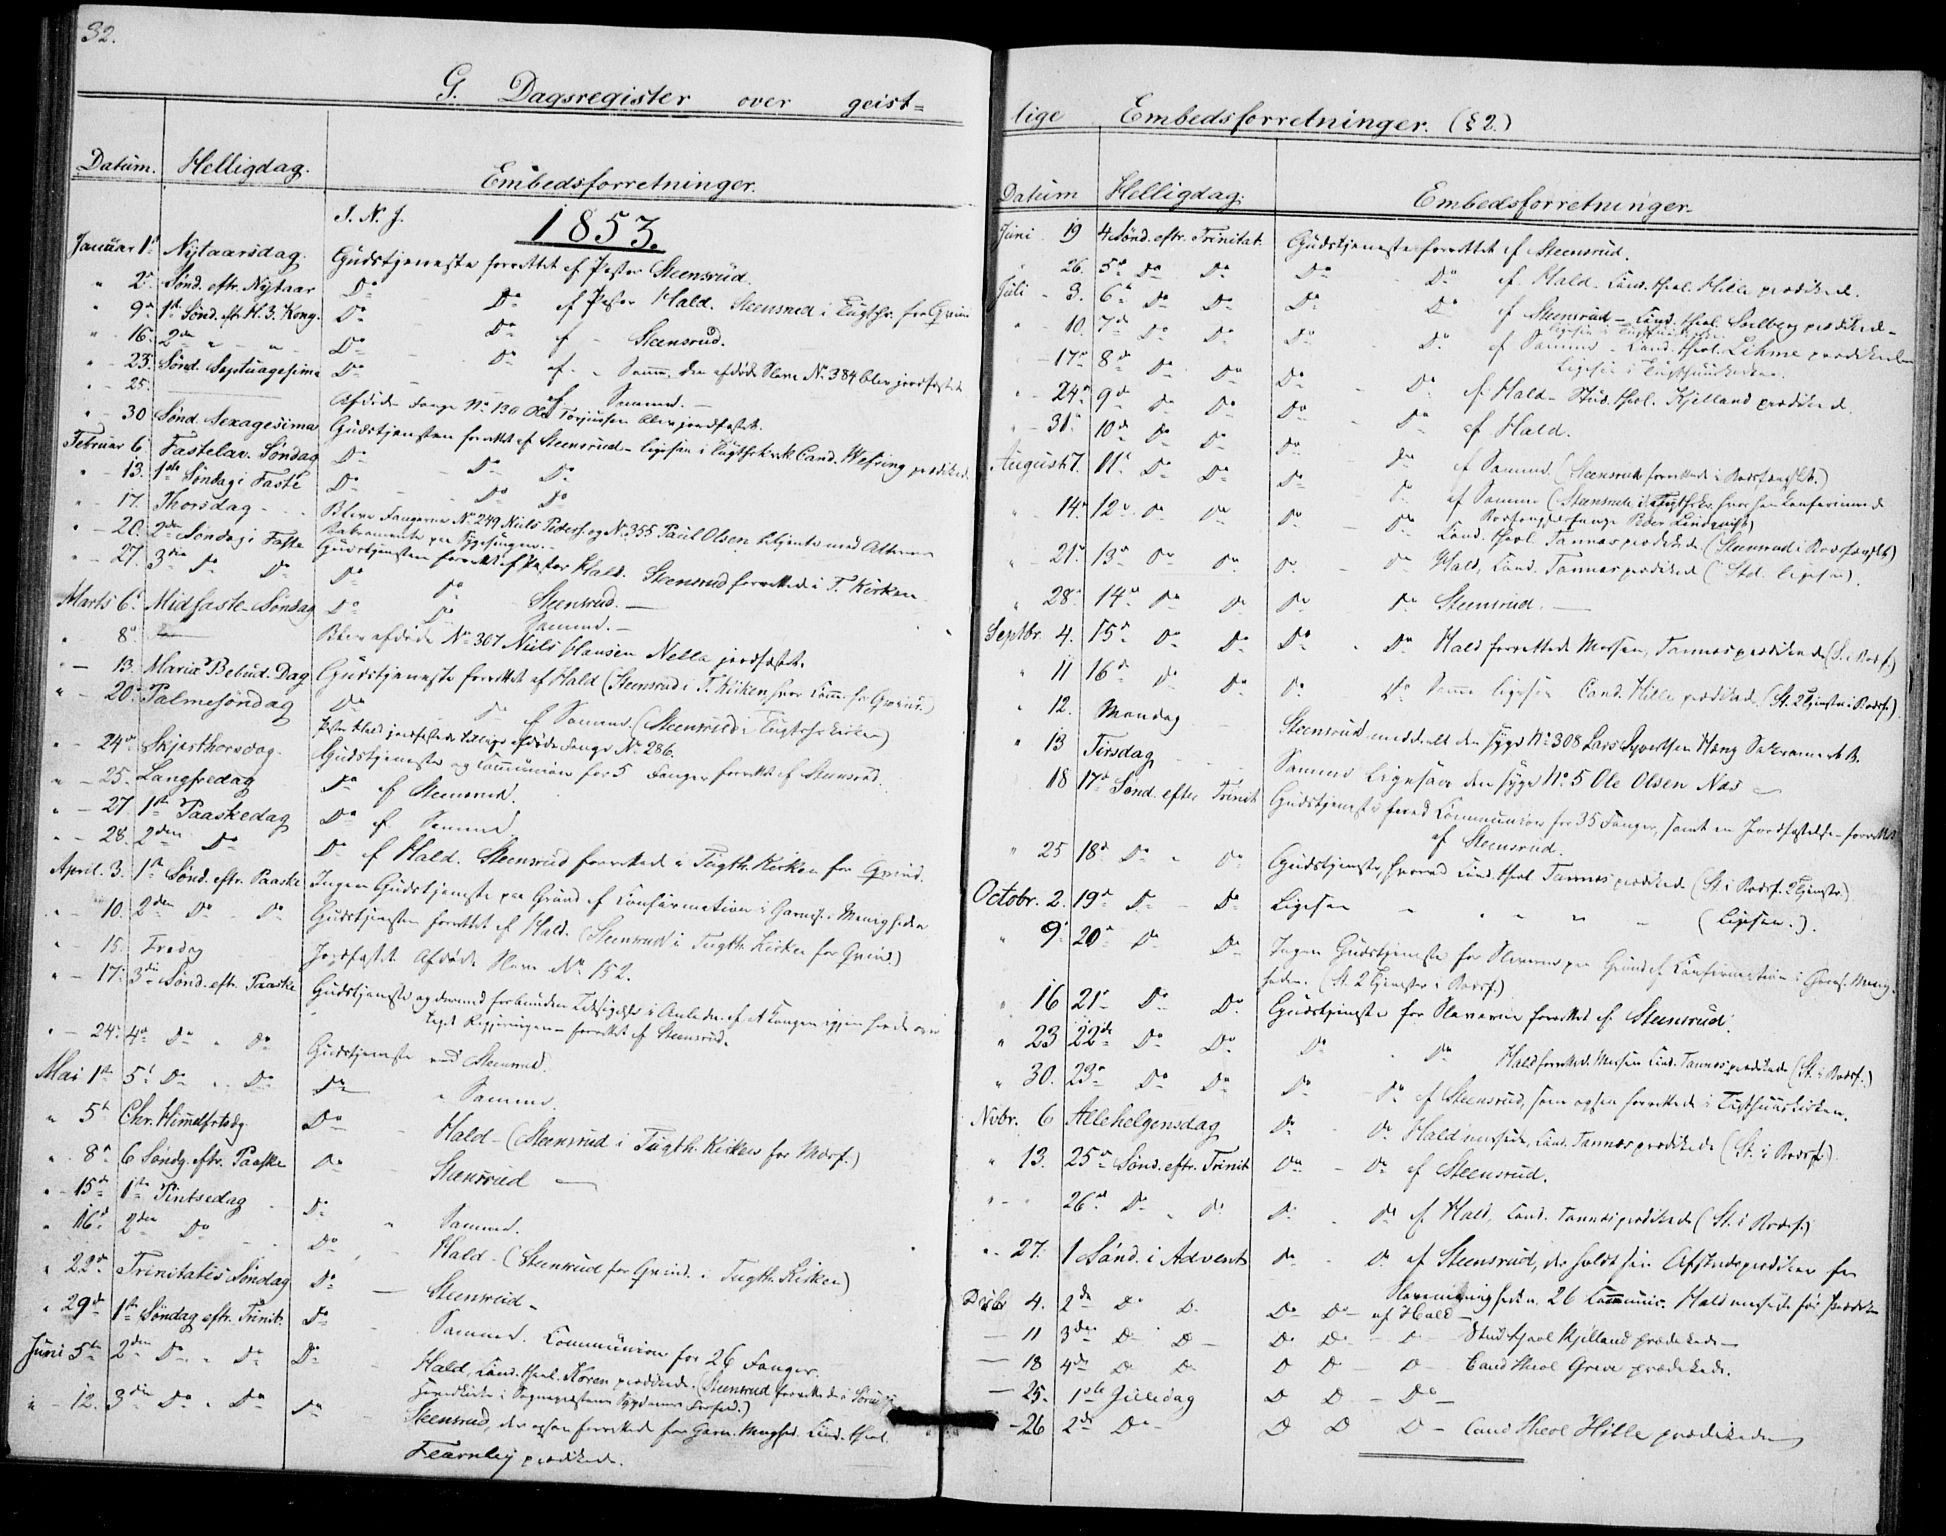 SAO, Akershus festnings slaveri Kirkebøker, F/Fa/L0002: Ministerialbok nr. 2, 1852-1883, s. 32